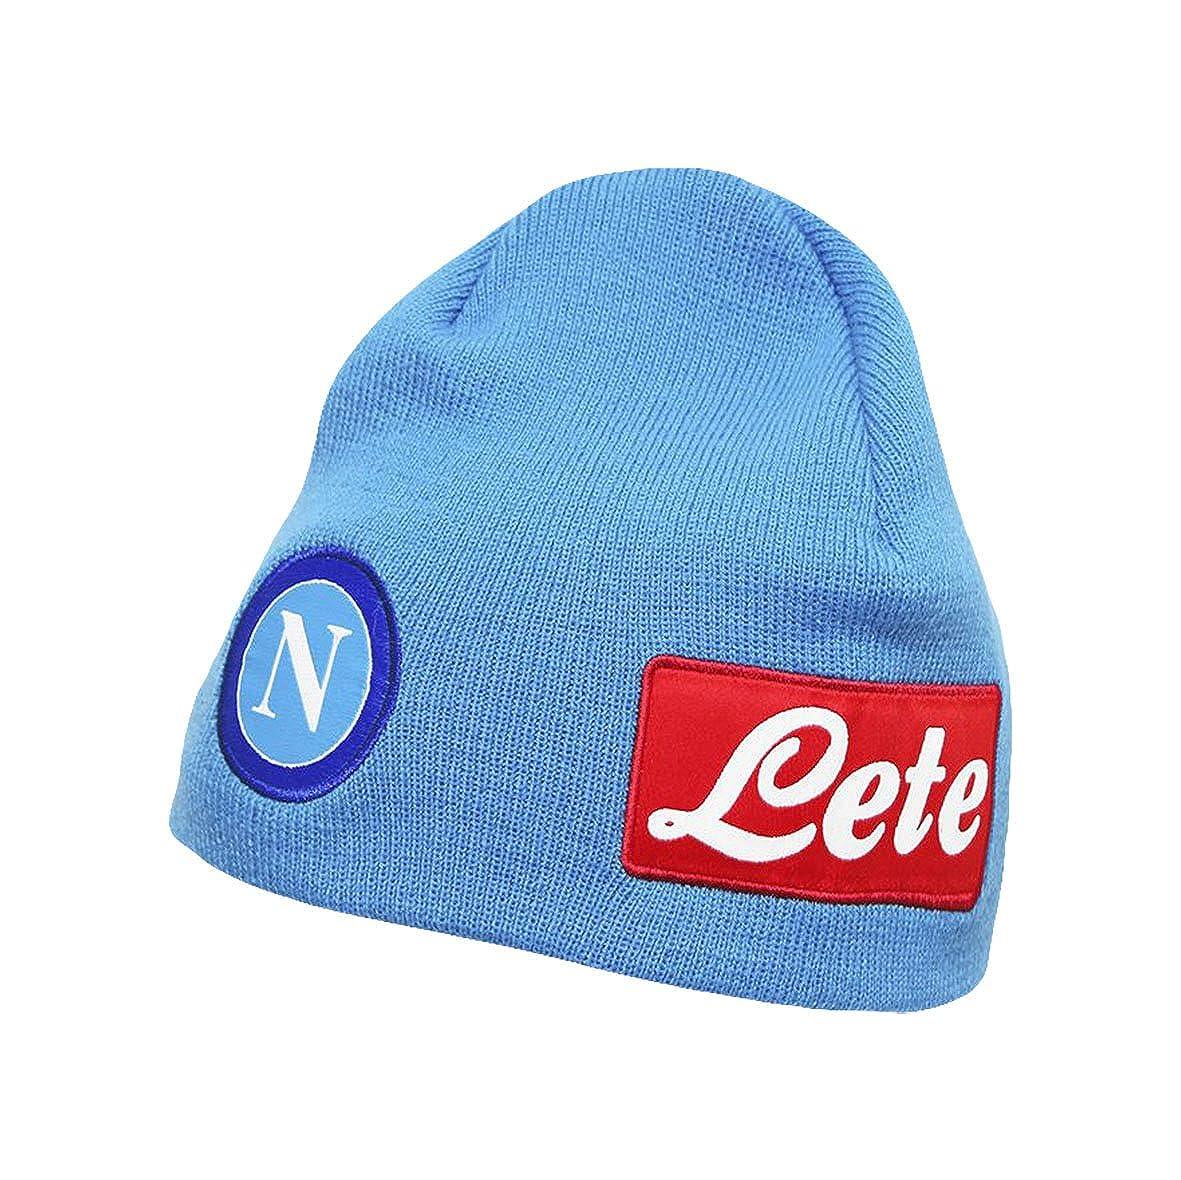 Hatten 2 Napoli Cappellino